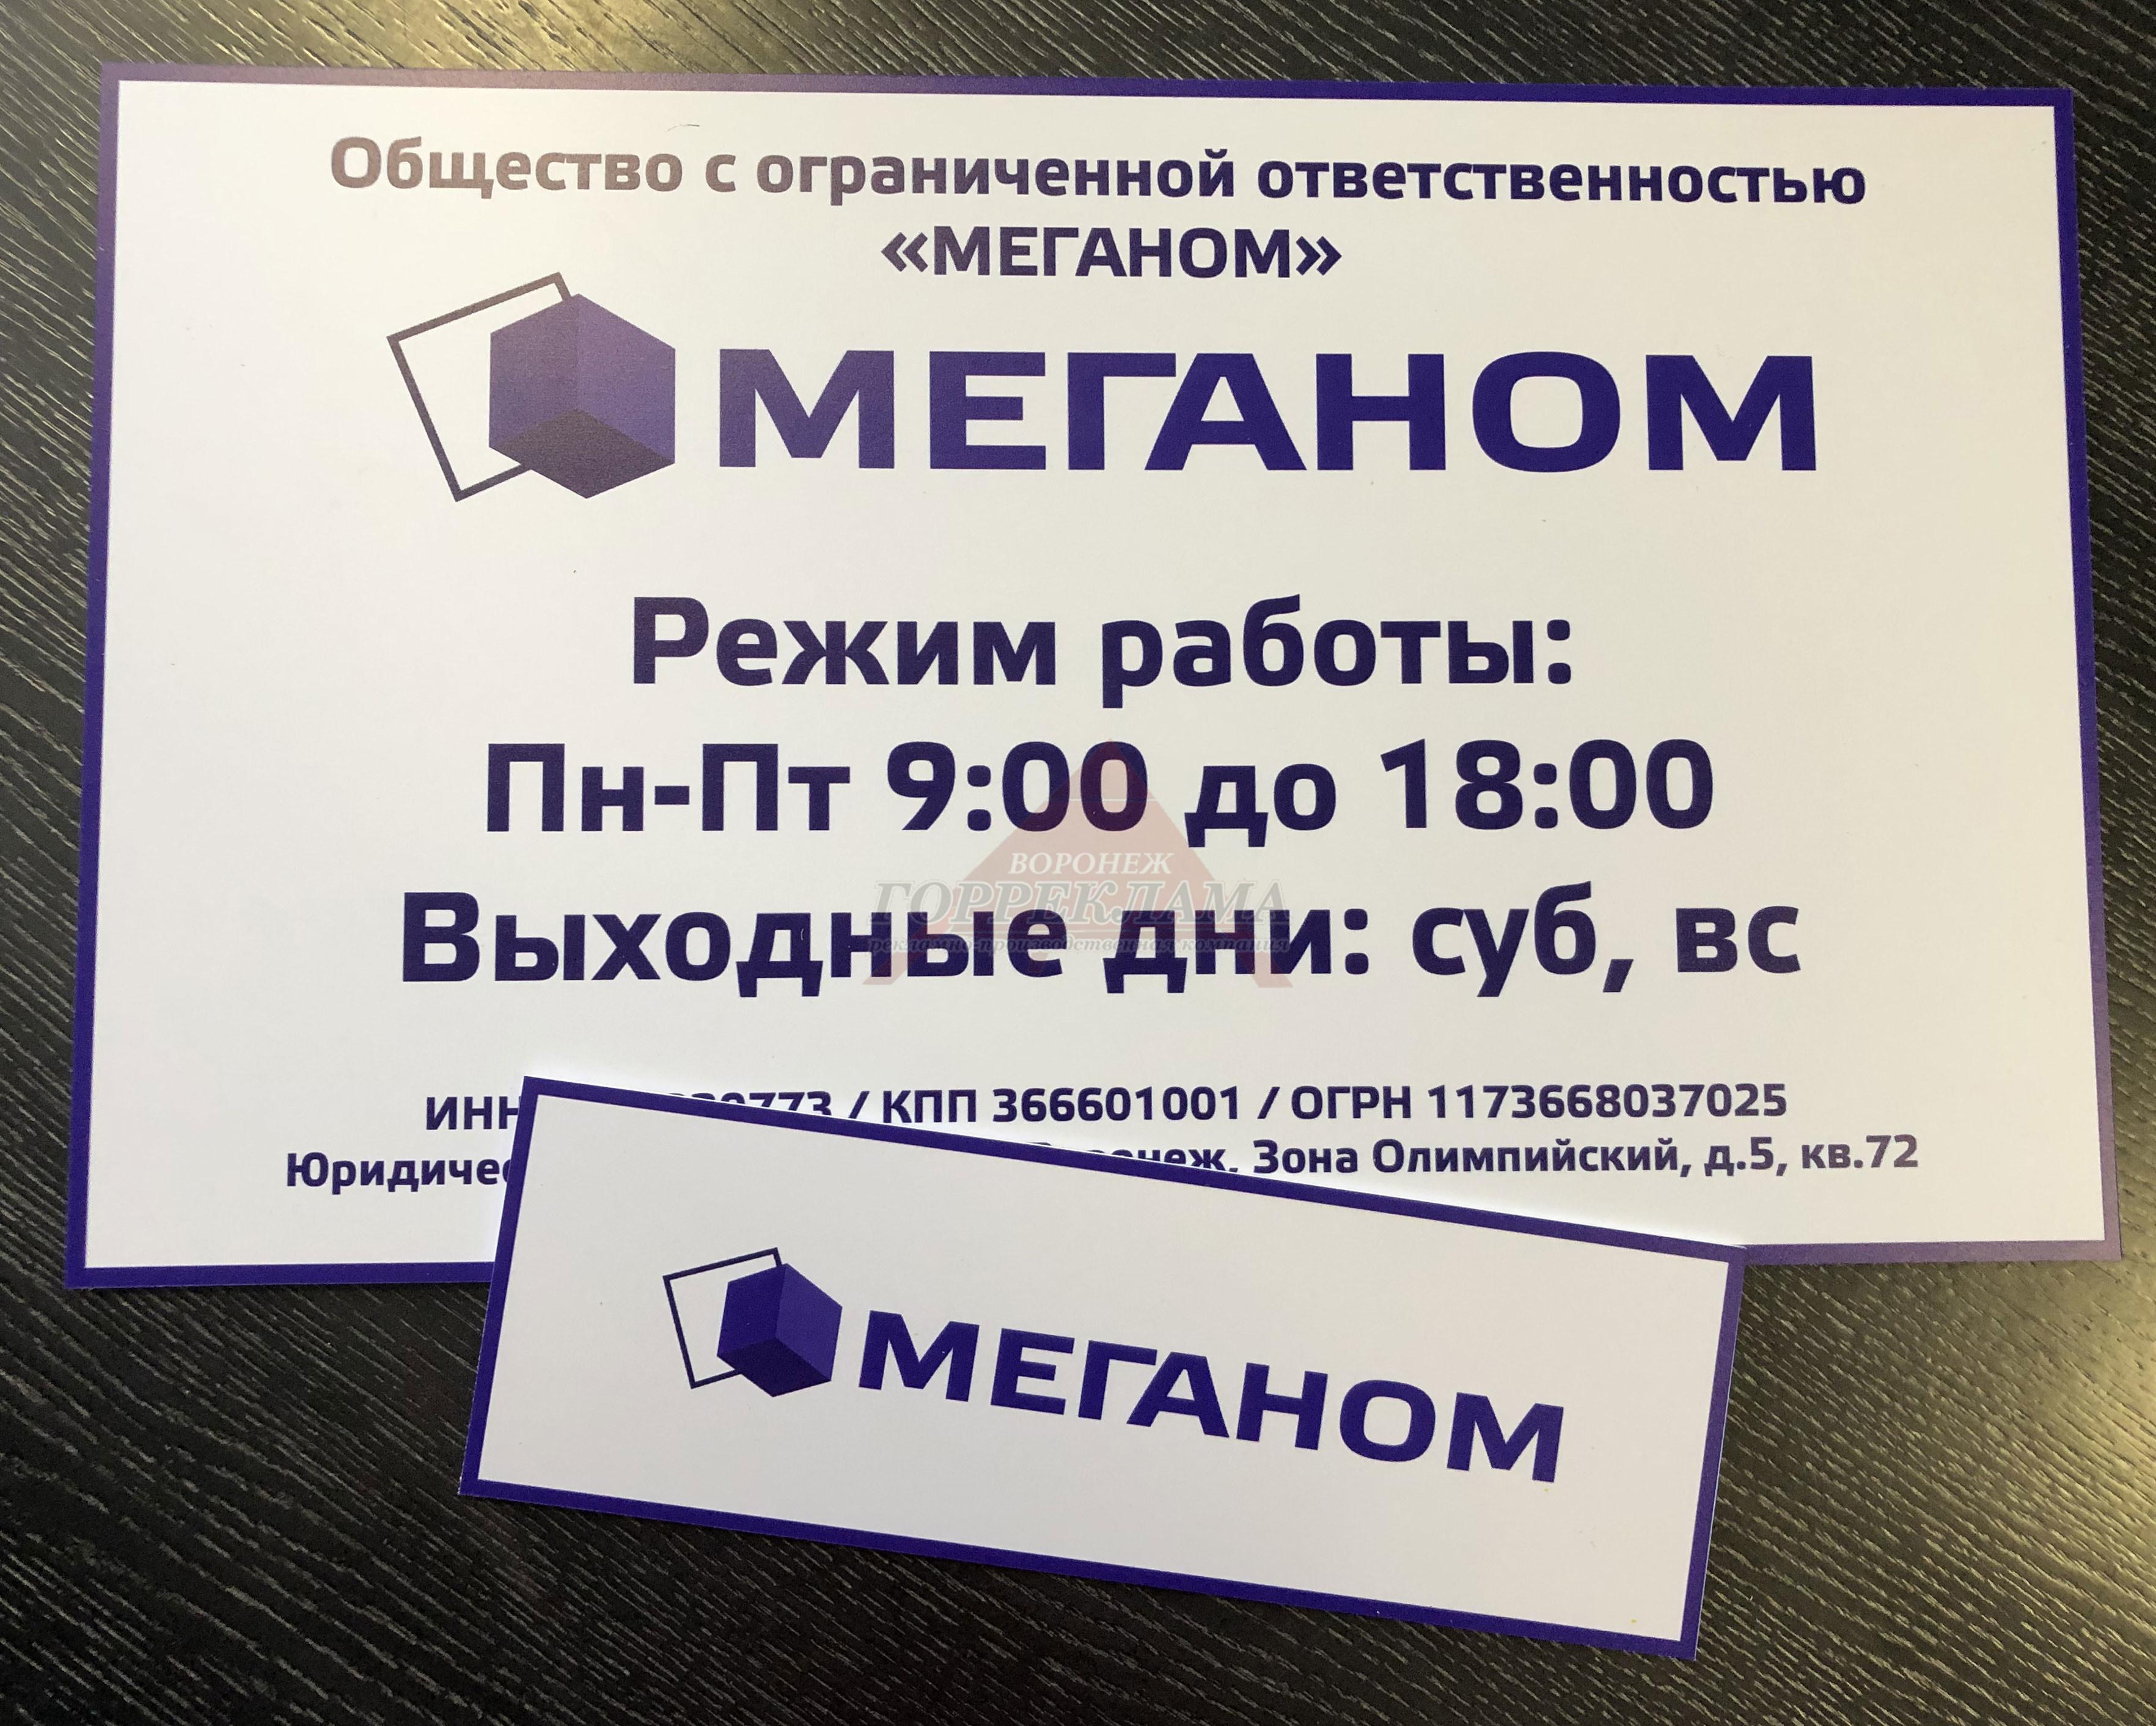 таблички-ПВХ-меганом-Воронеж